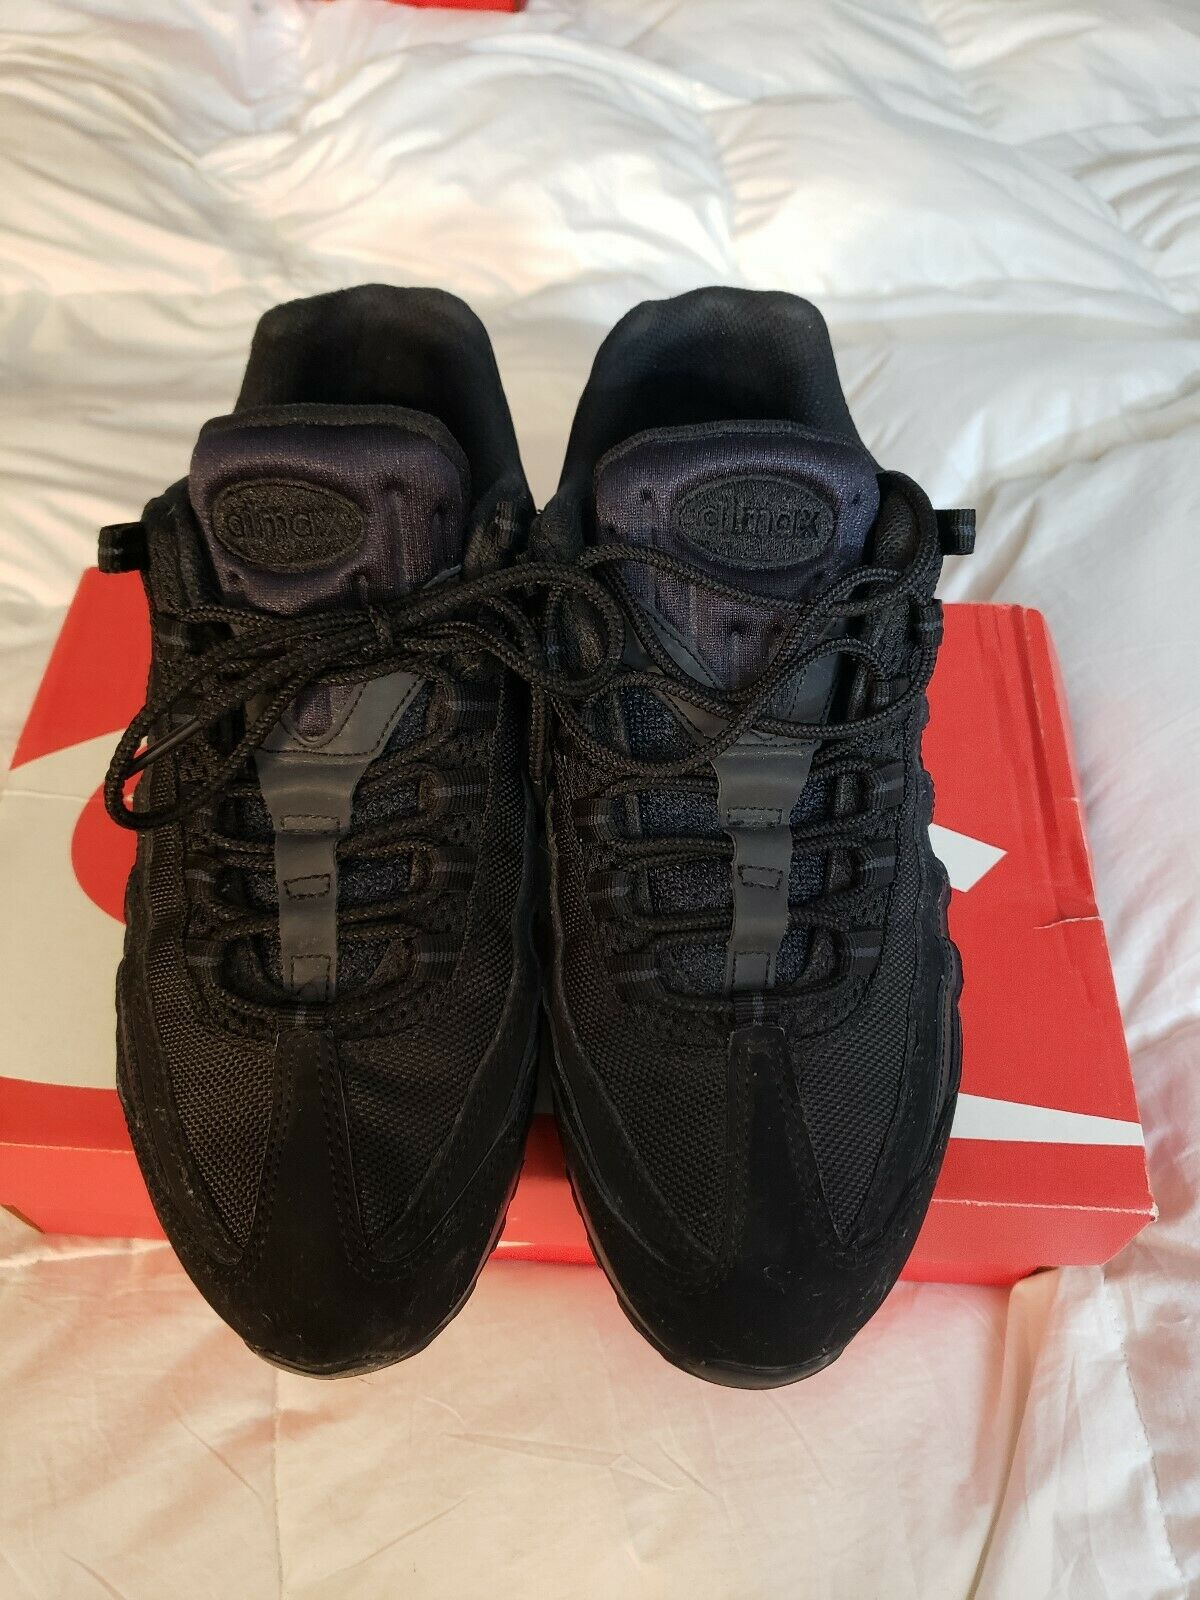 Nike Air Max '95 3M Mens Black on Blackshoes Size 8.5